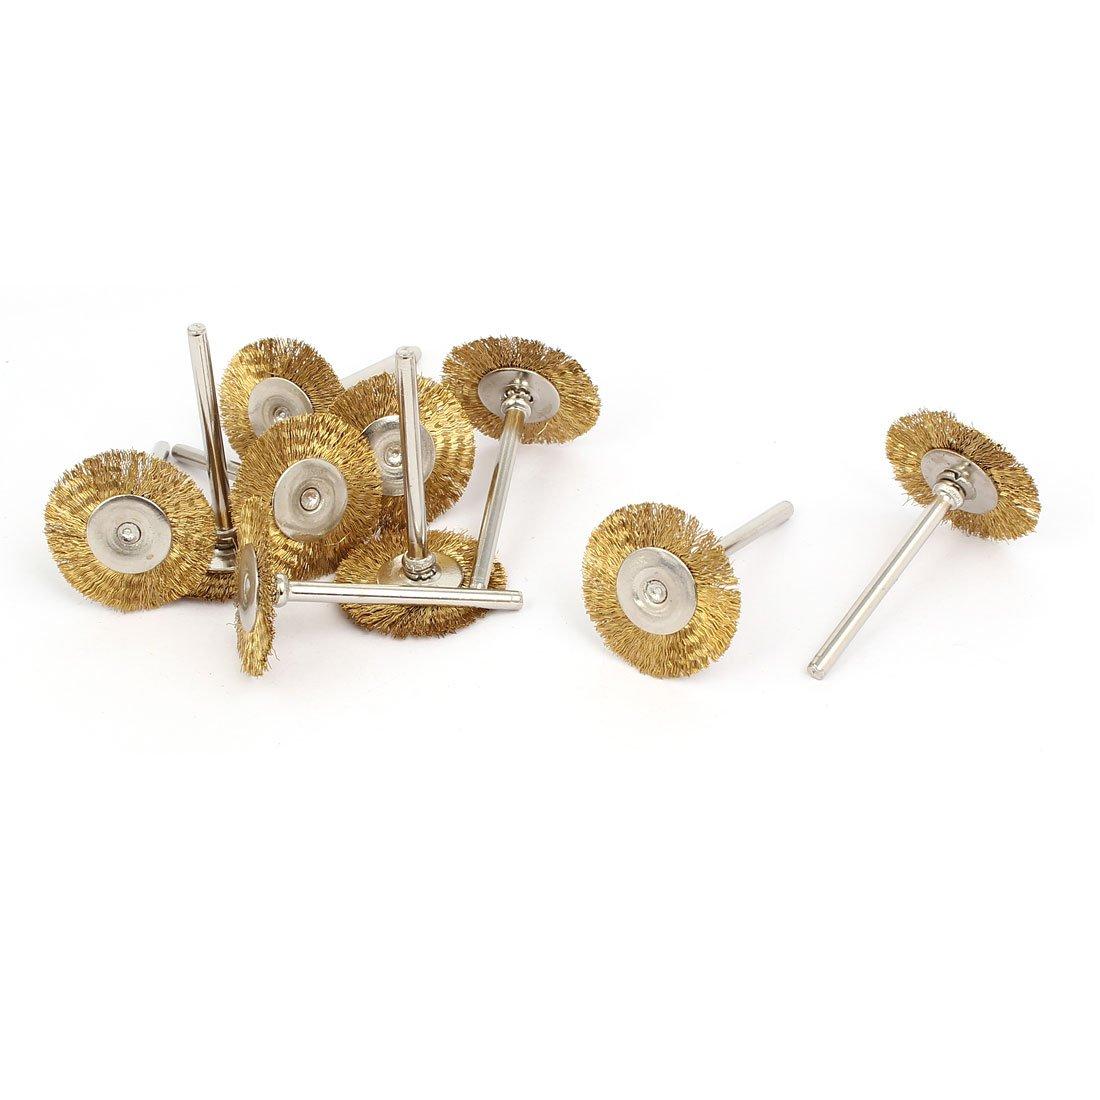 uxcell2.35mm Shank 25mm Head Dia Brass Wire Polishing Brush Wheel Buffing Tool 10pcs